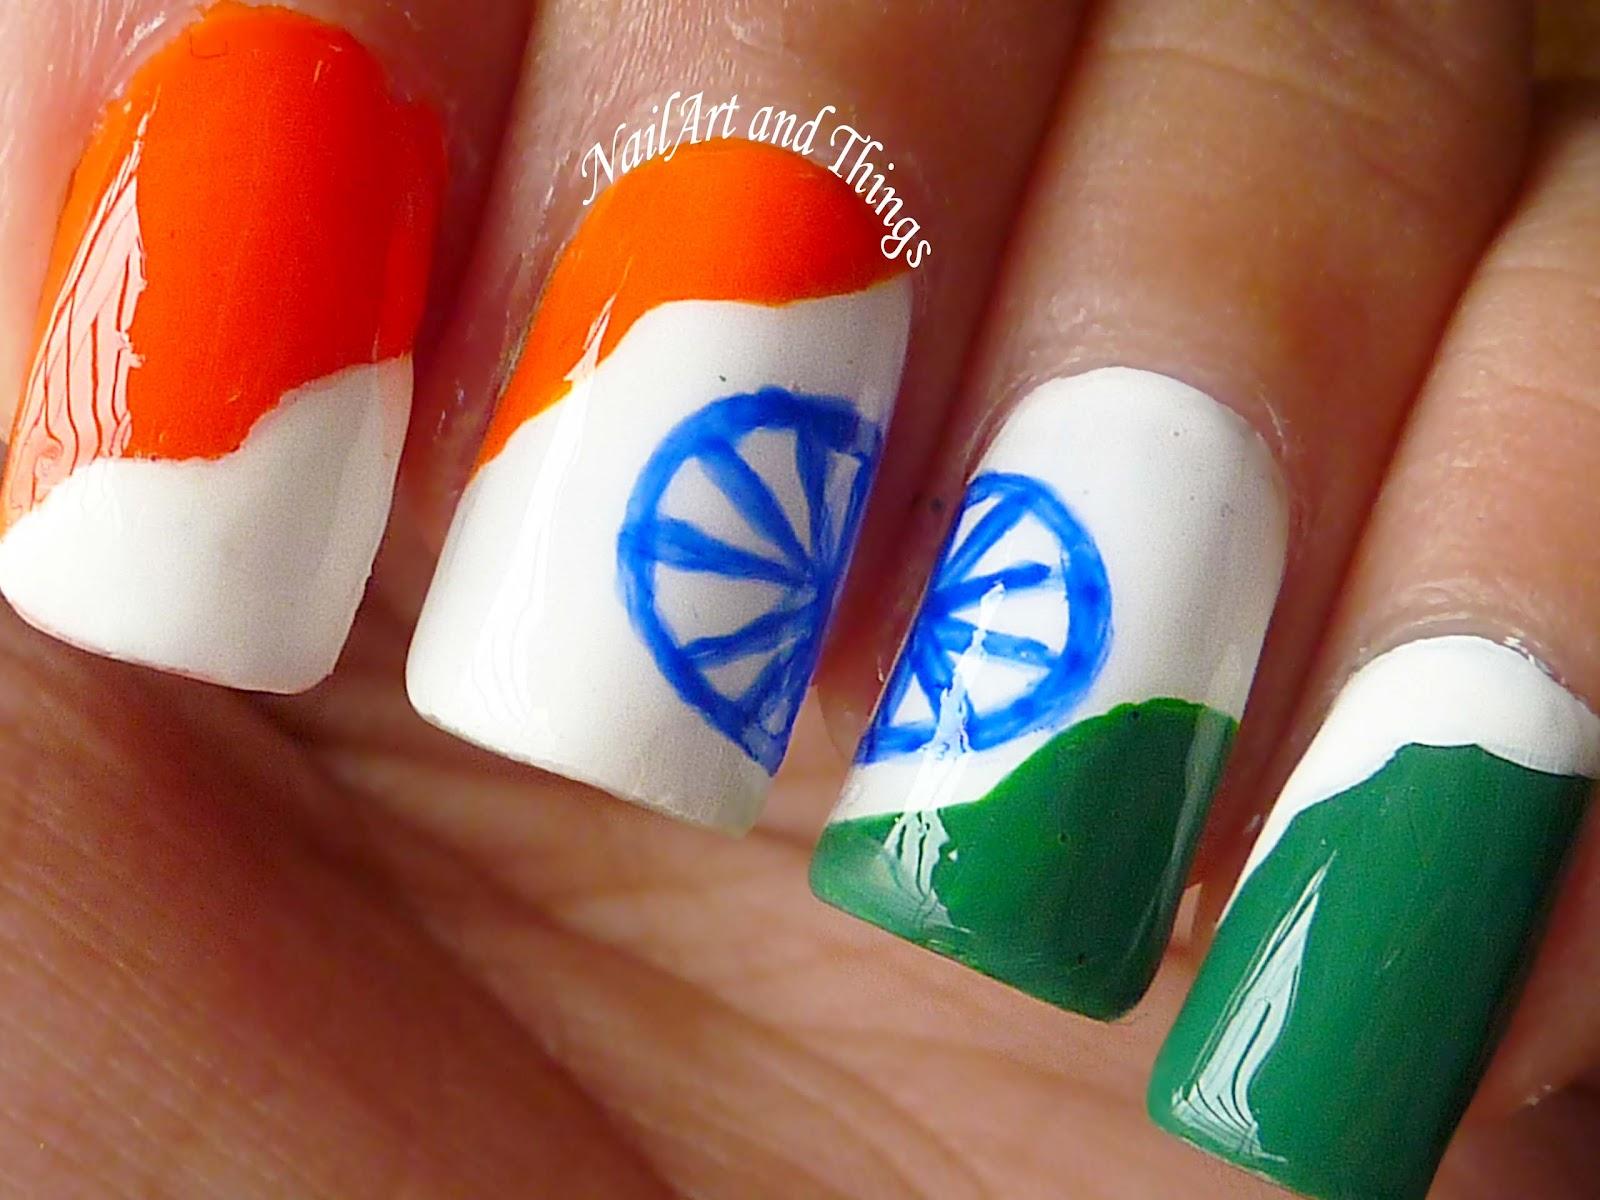 Pakistan Independence Day Nail Art 4 Designs: NailArt And Things: Independence Day Nail Art: Indian